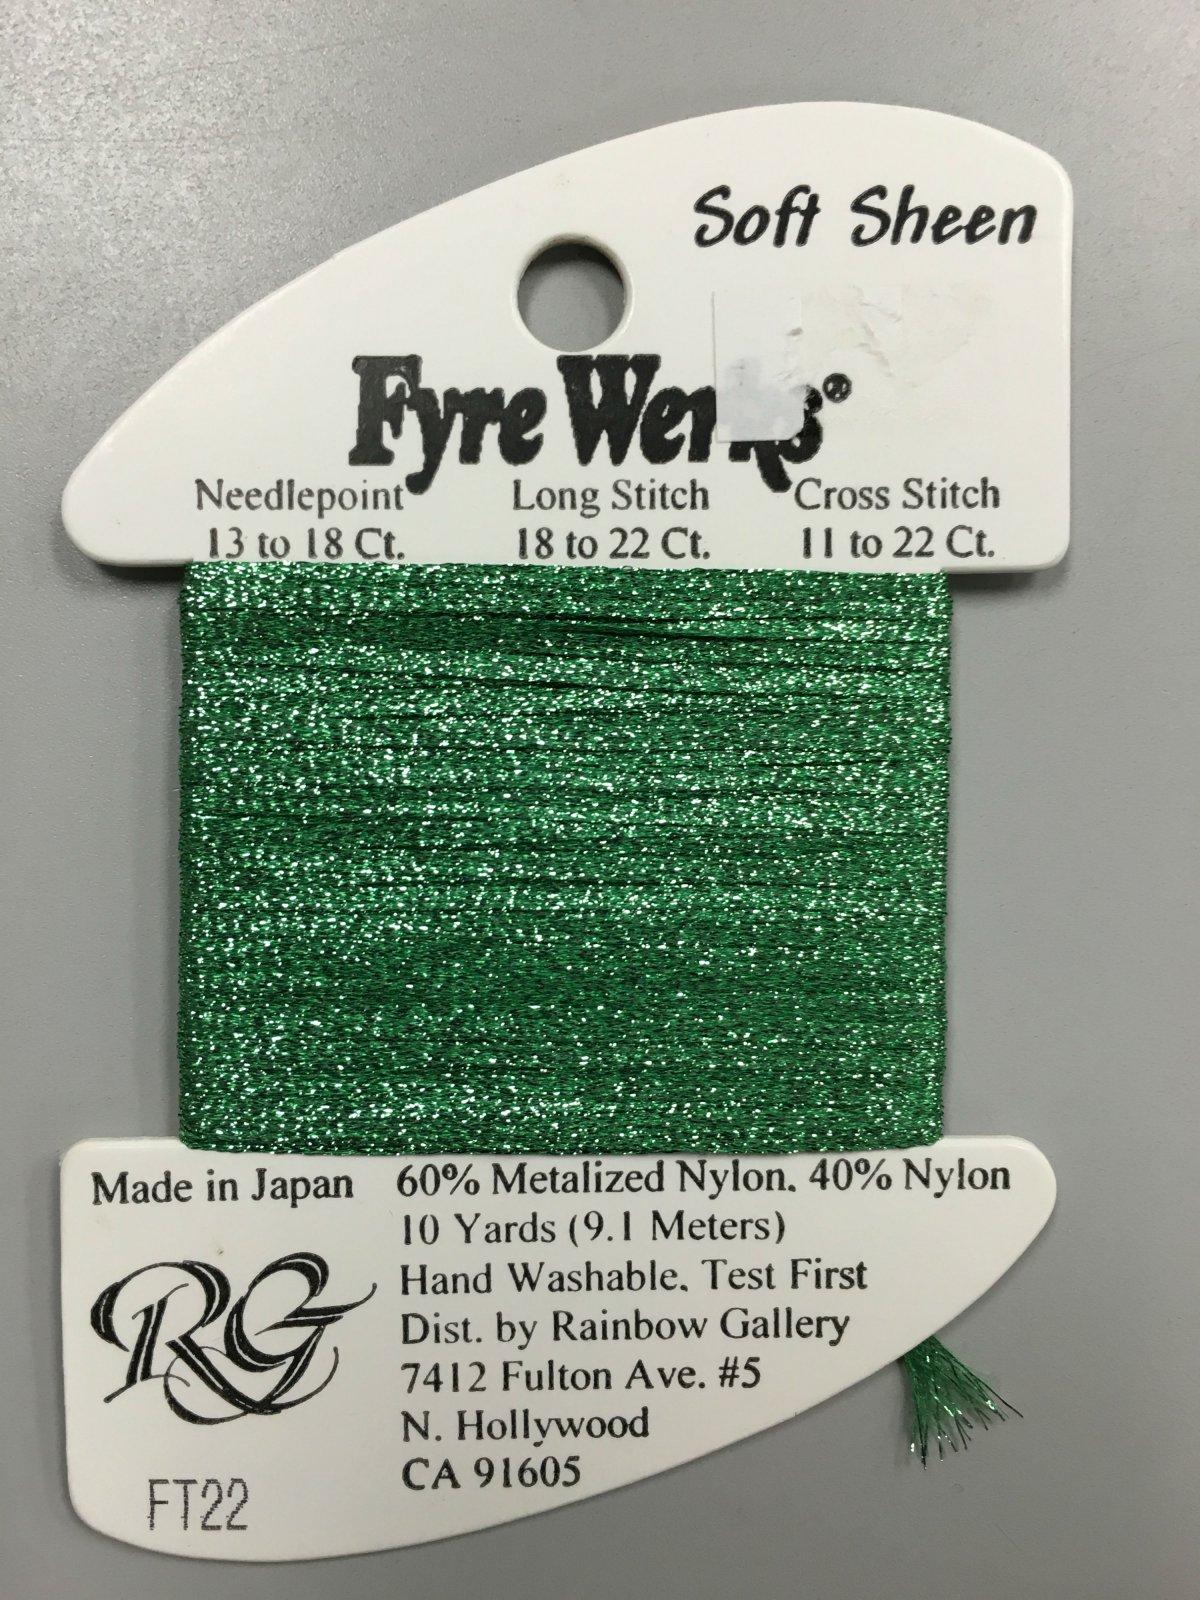 Fyre Werks Soft Sheen FT22